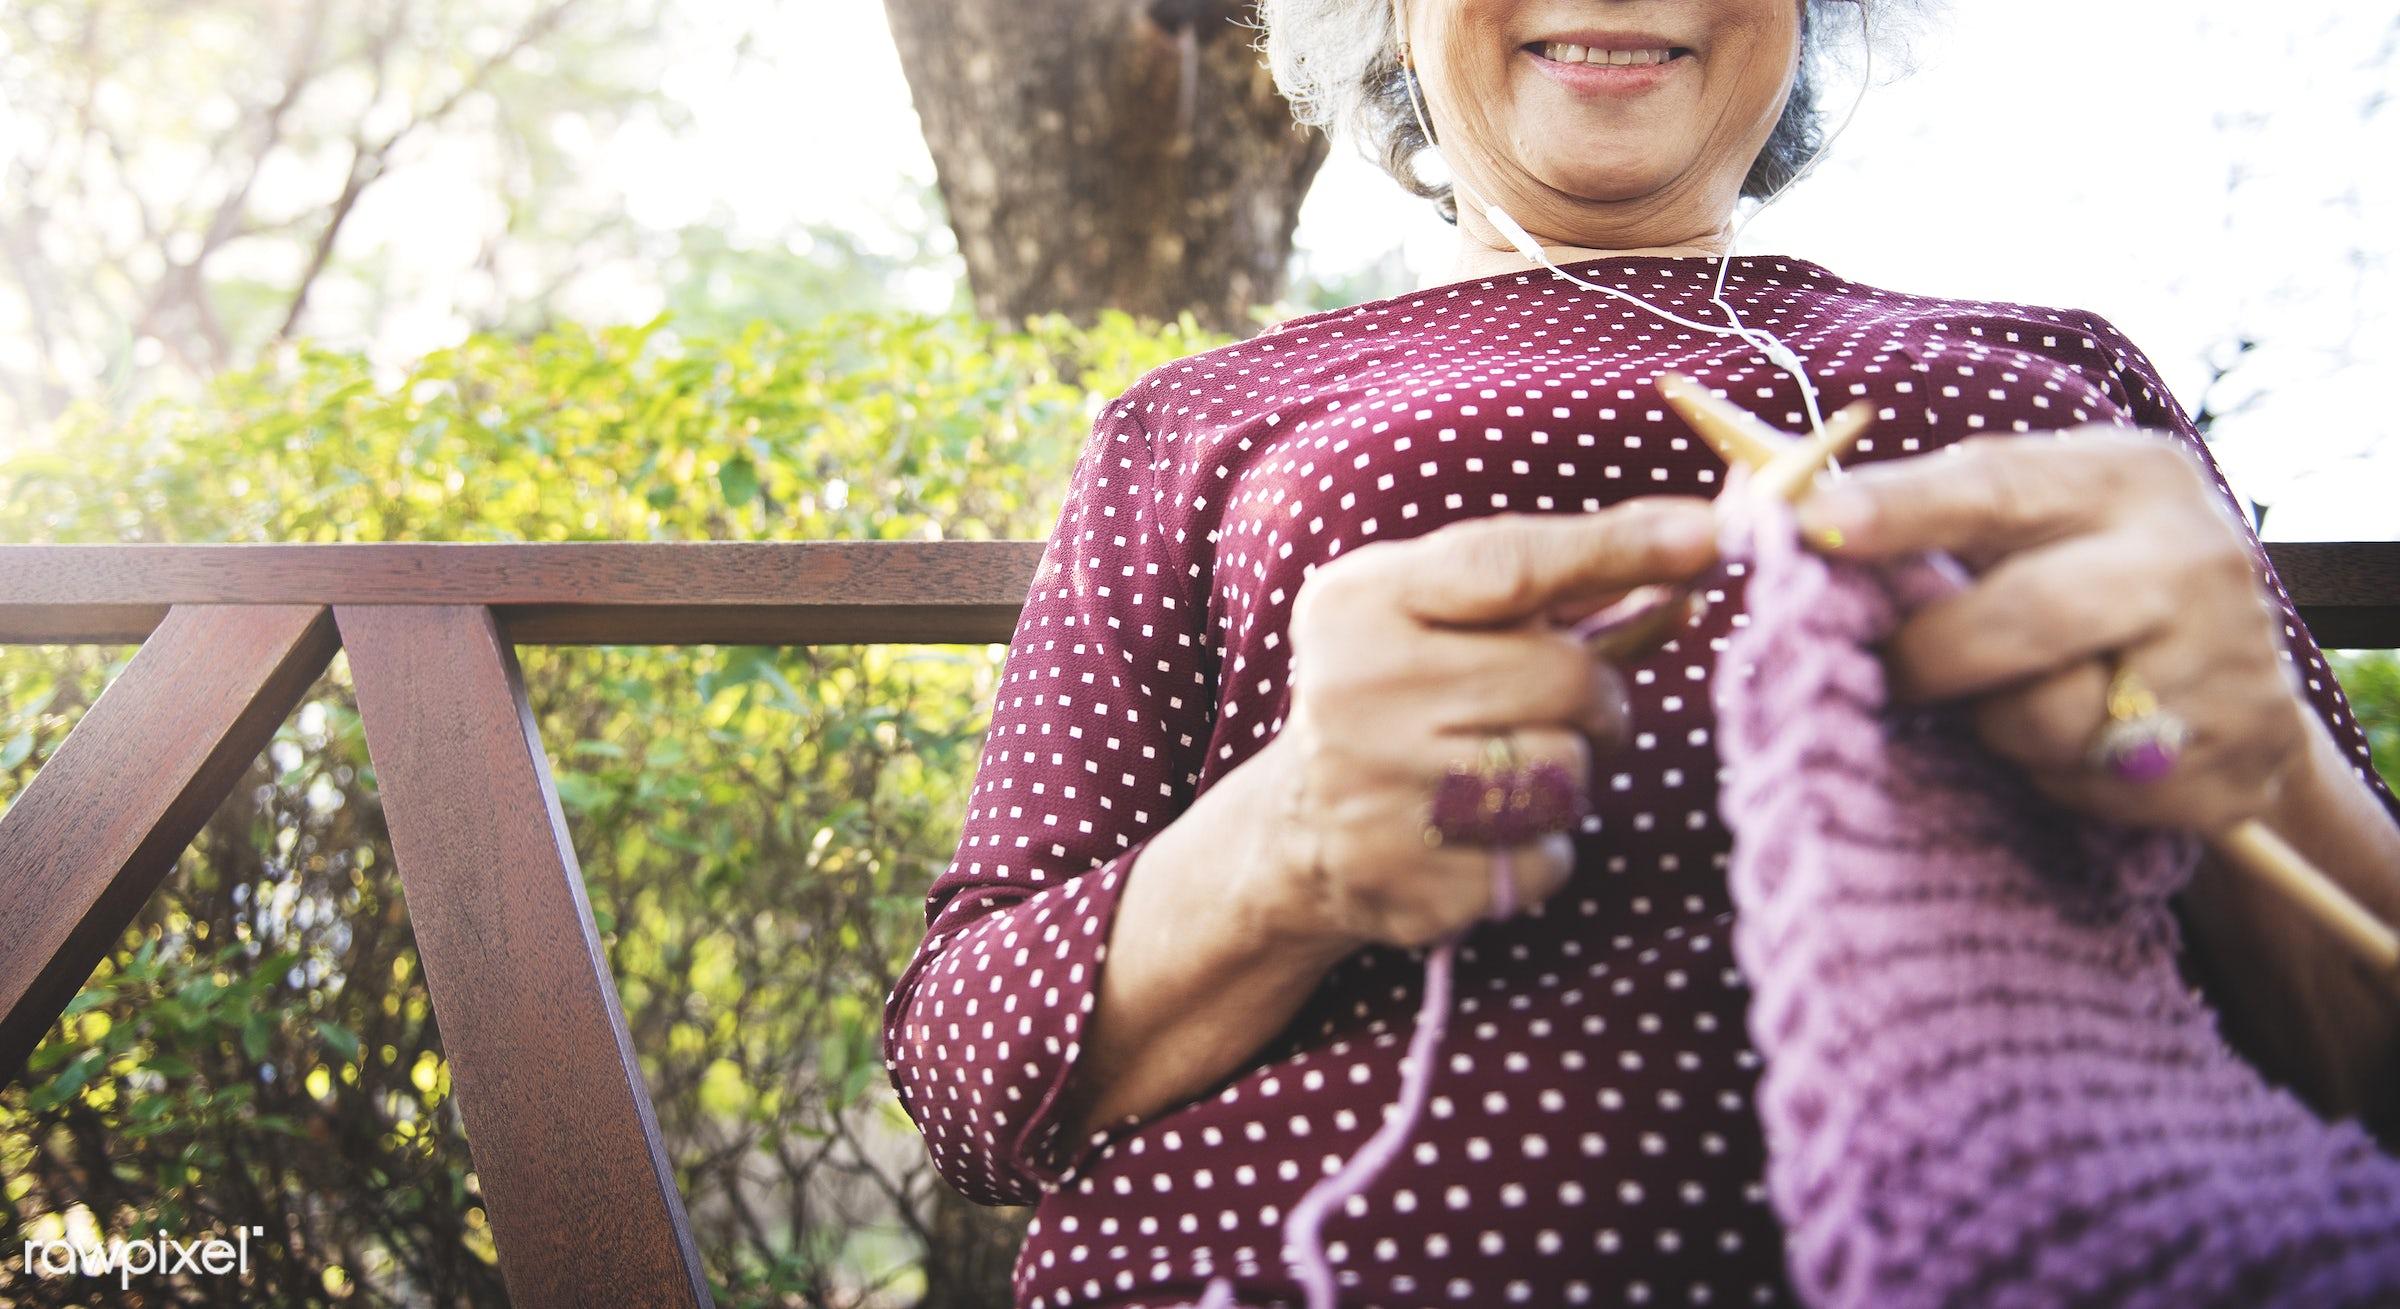 activity, art, artistic, asian, asian ethnicity, cheerful, clothing, creative, creativity, crochet, crocheting, elderly, fun...